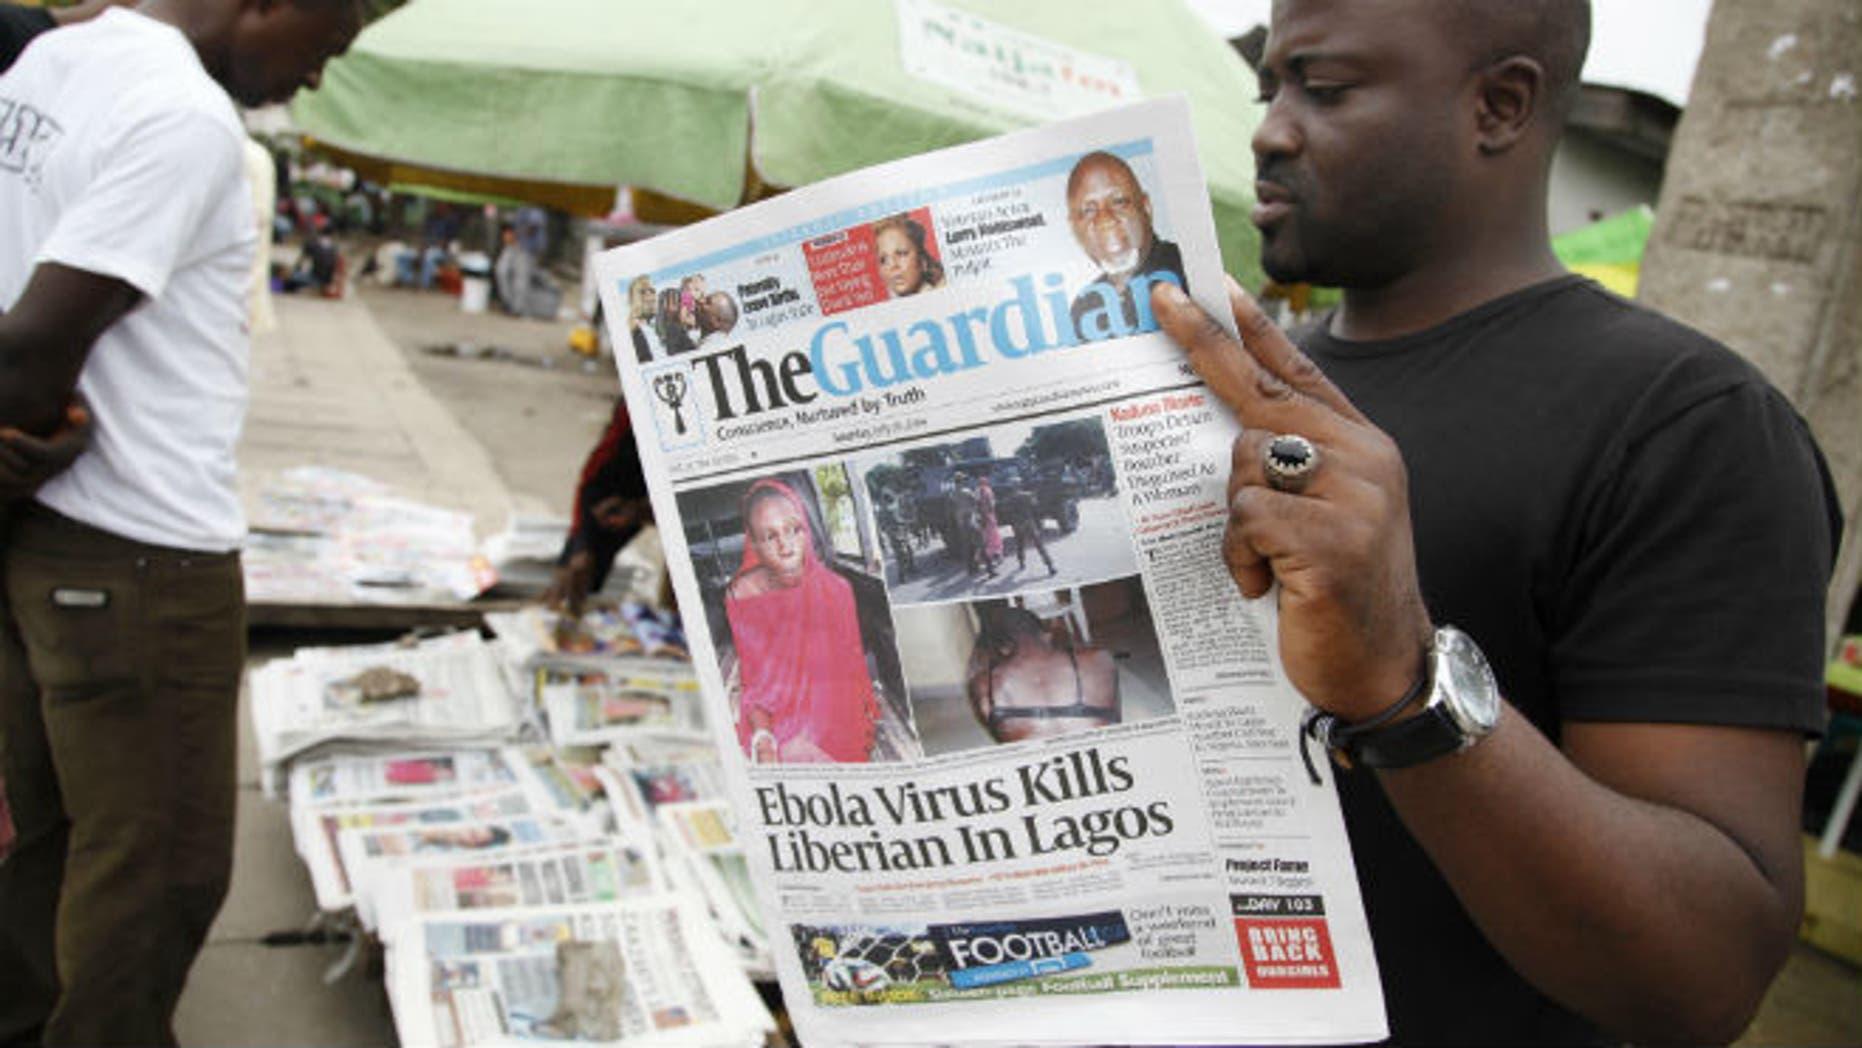 A man reads a local newspaperson a street with the headline Ebola Virus kills Liberian in Lagos, in Lagos Nigeria, Saturday, July 26, 2014. (AP Photo/Sunday Alamba)